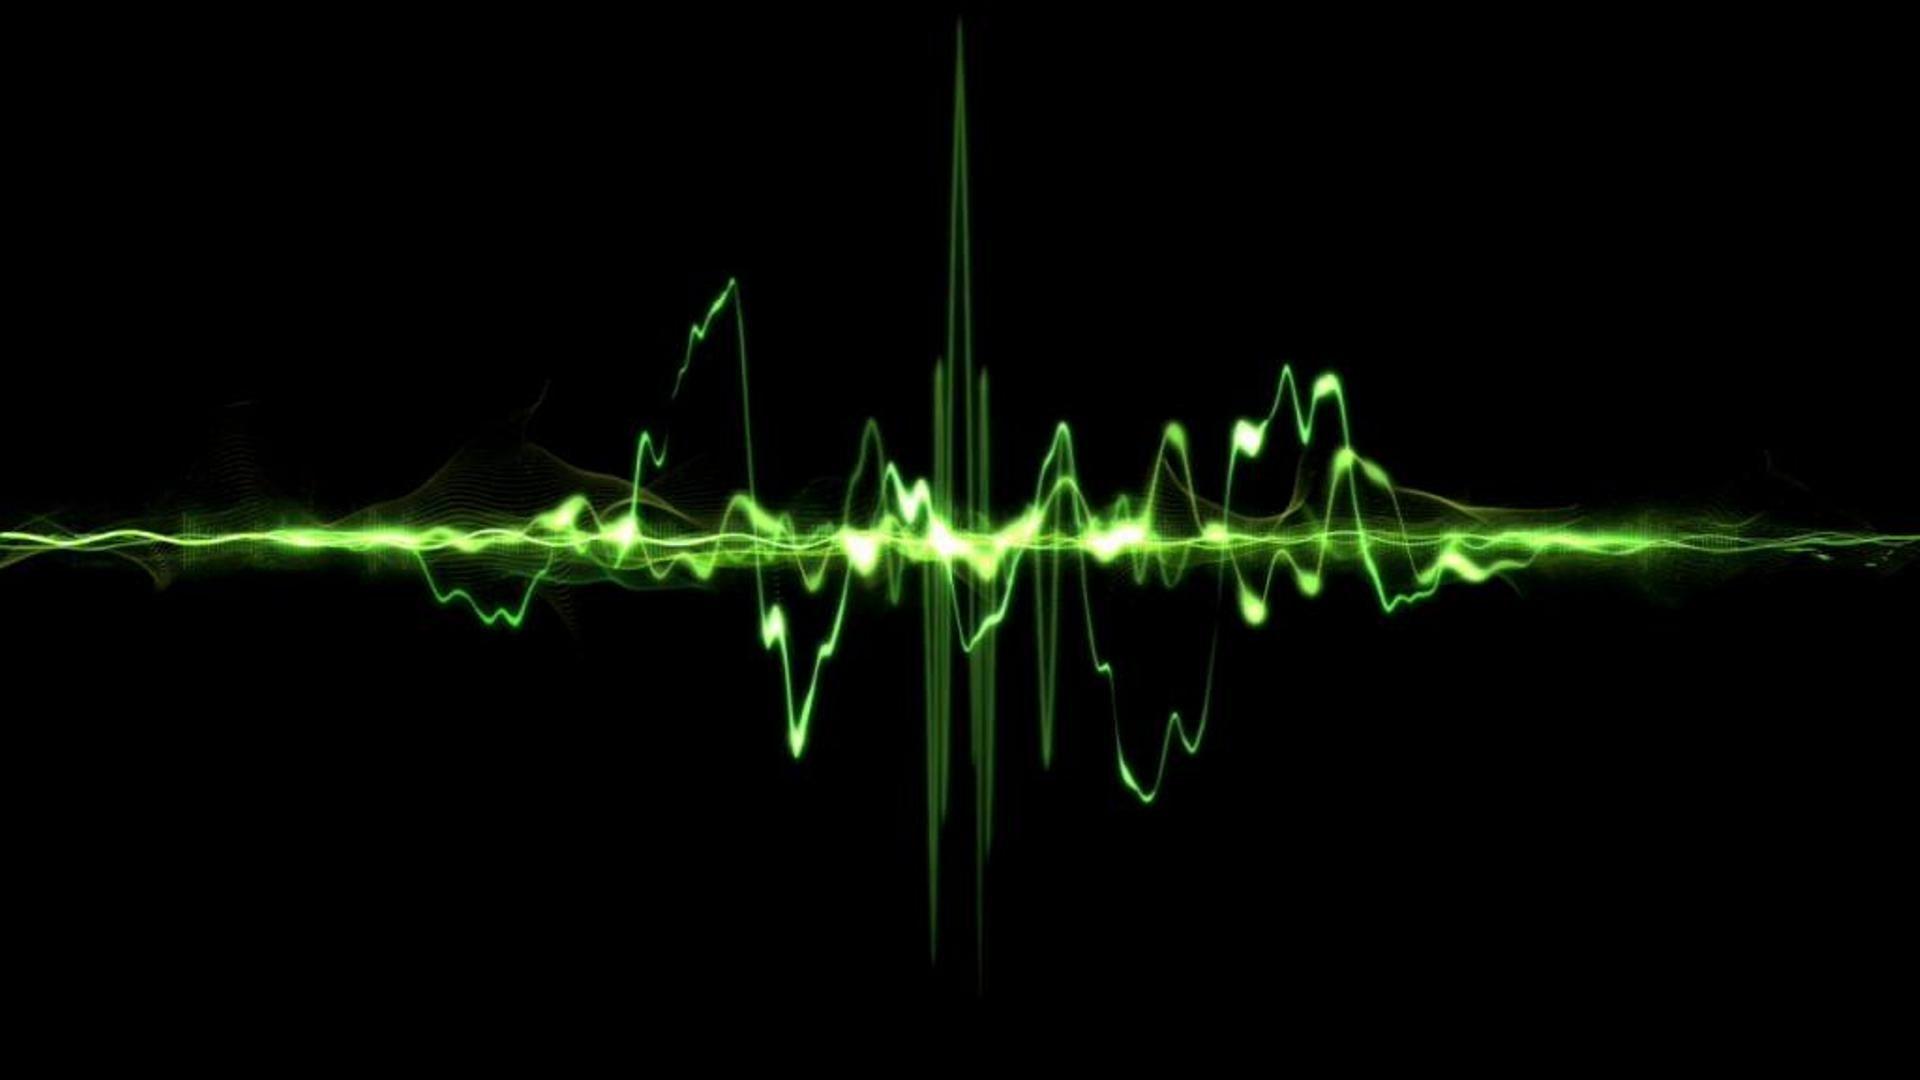 Vibration Frequency Google Search Red Wallpaper Hd Wallpaper Desktop Wallpaper